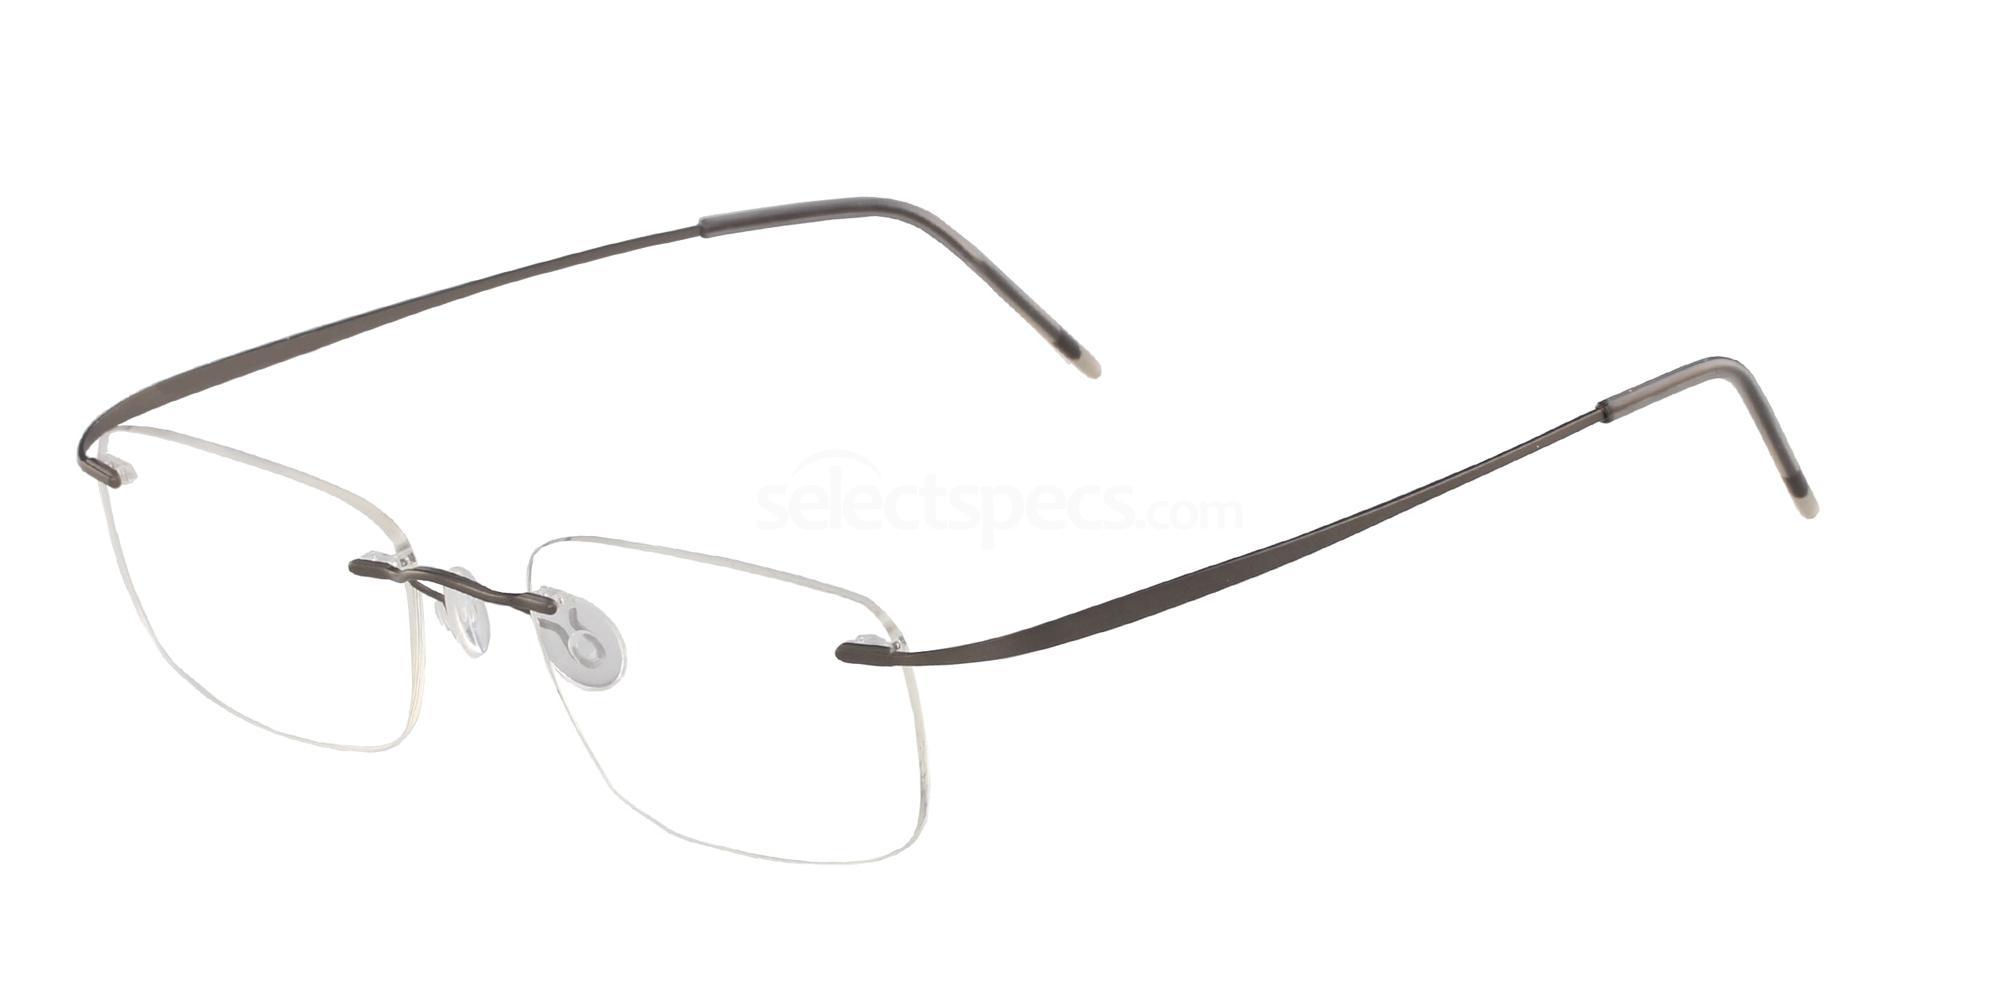 033 ELEMENT 200 Glasses, AIRLOCK